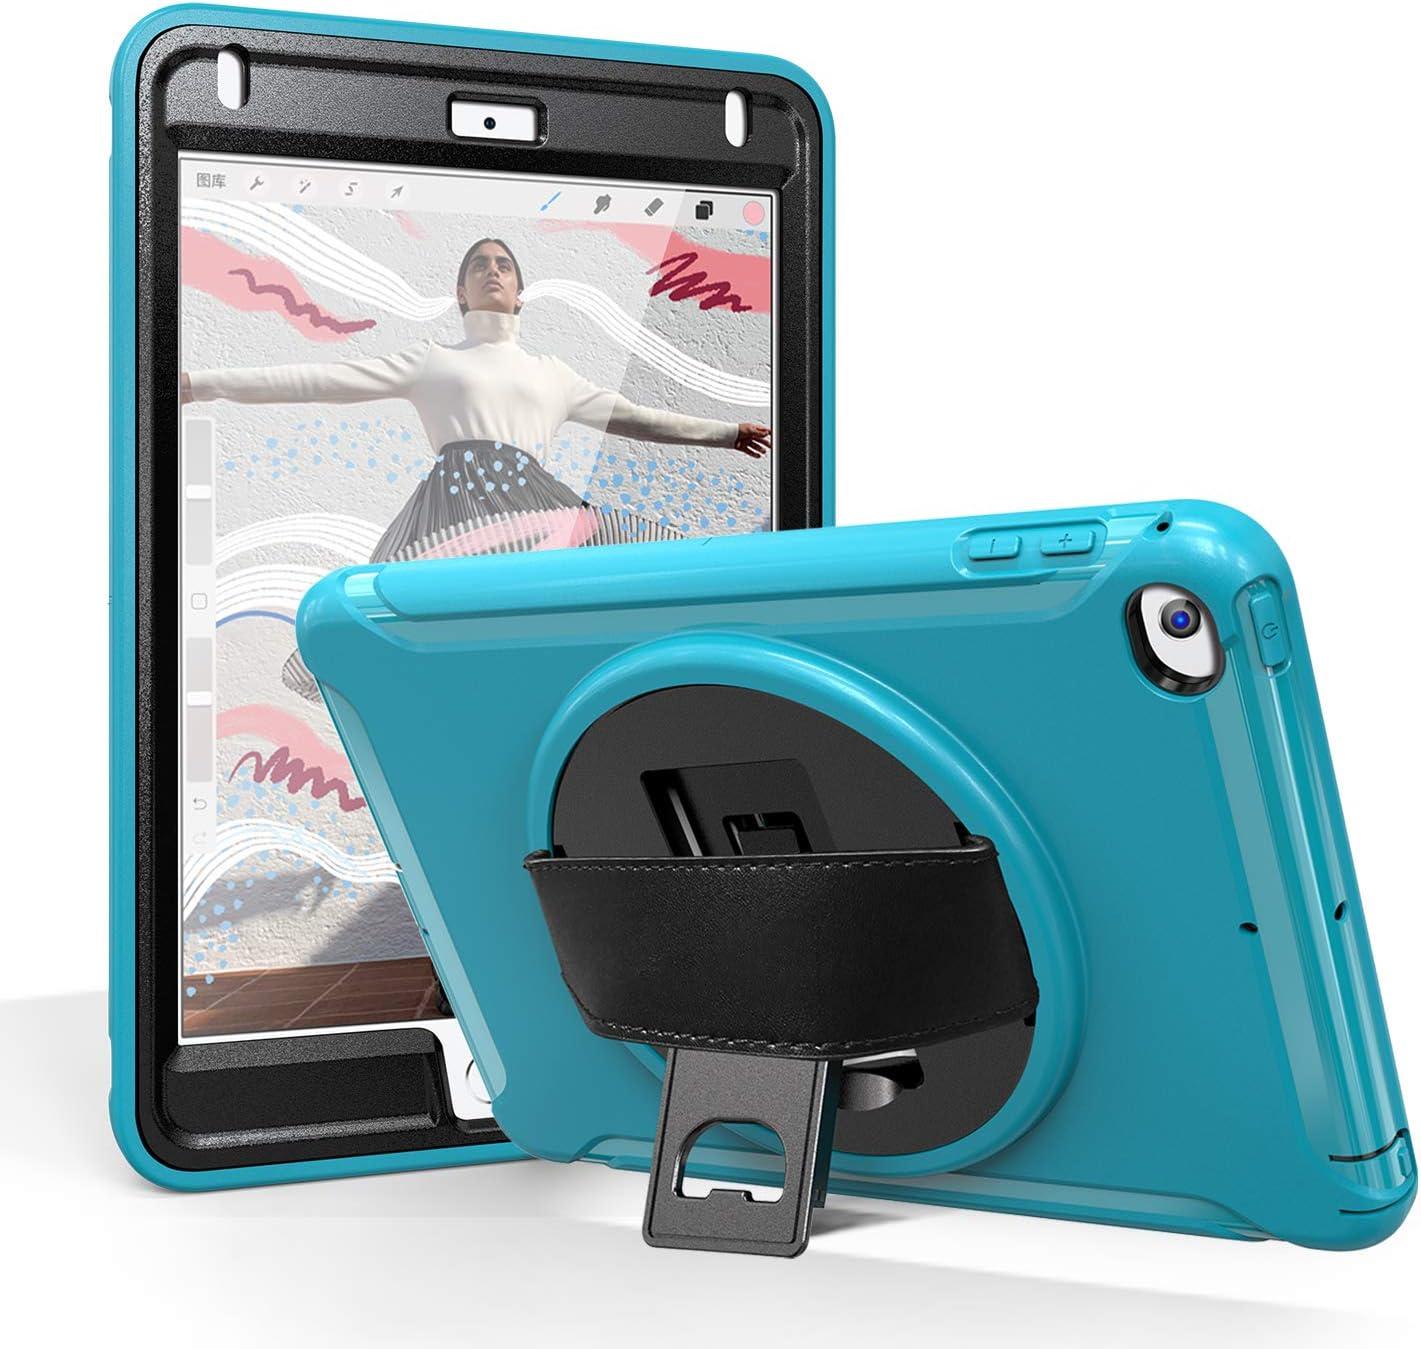 iPad Mini 4 Case/iPad Mini 5 Case for Kids, BATYUE [Full-Body] & [Shock Proof] with 360° Rotating Kickstand+Hand Strap Hybrid Armor Protective Case for iPad Mini 5th/ 4th Generation Case (Light Blue)